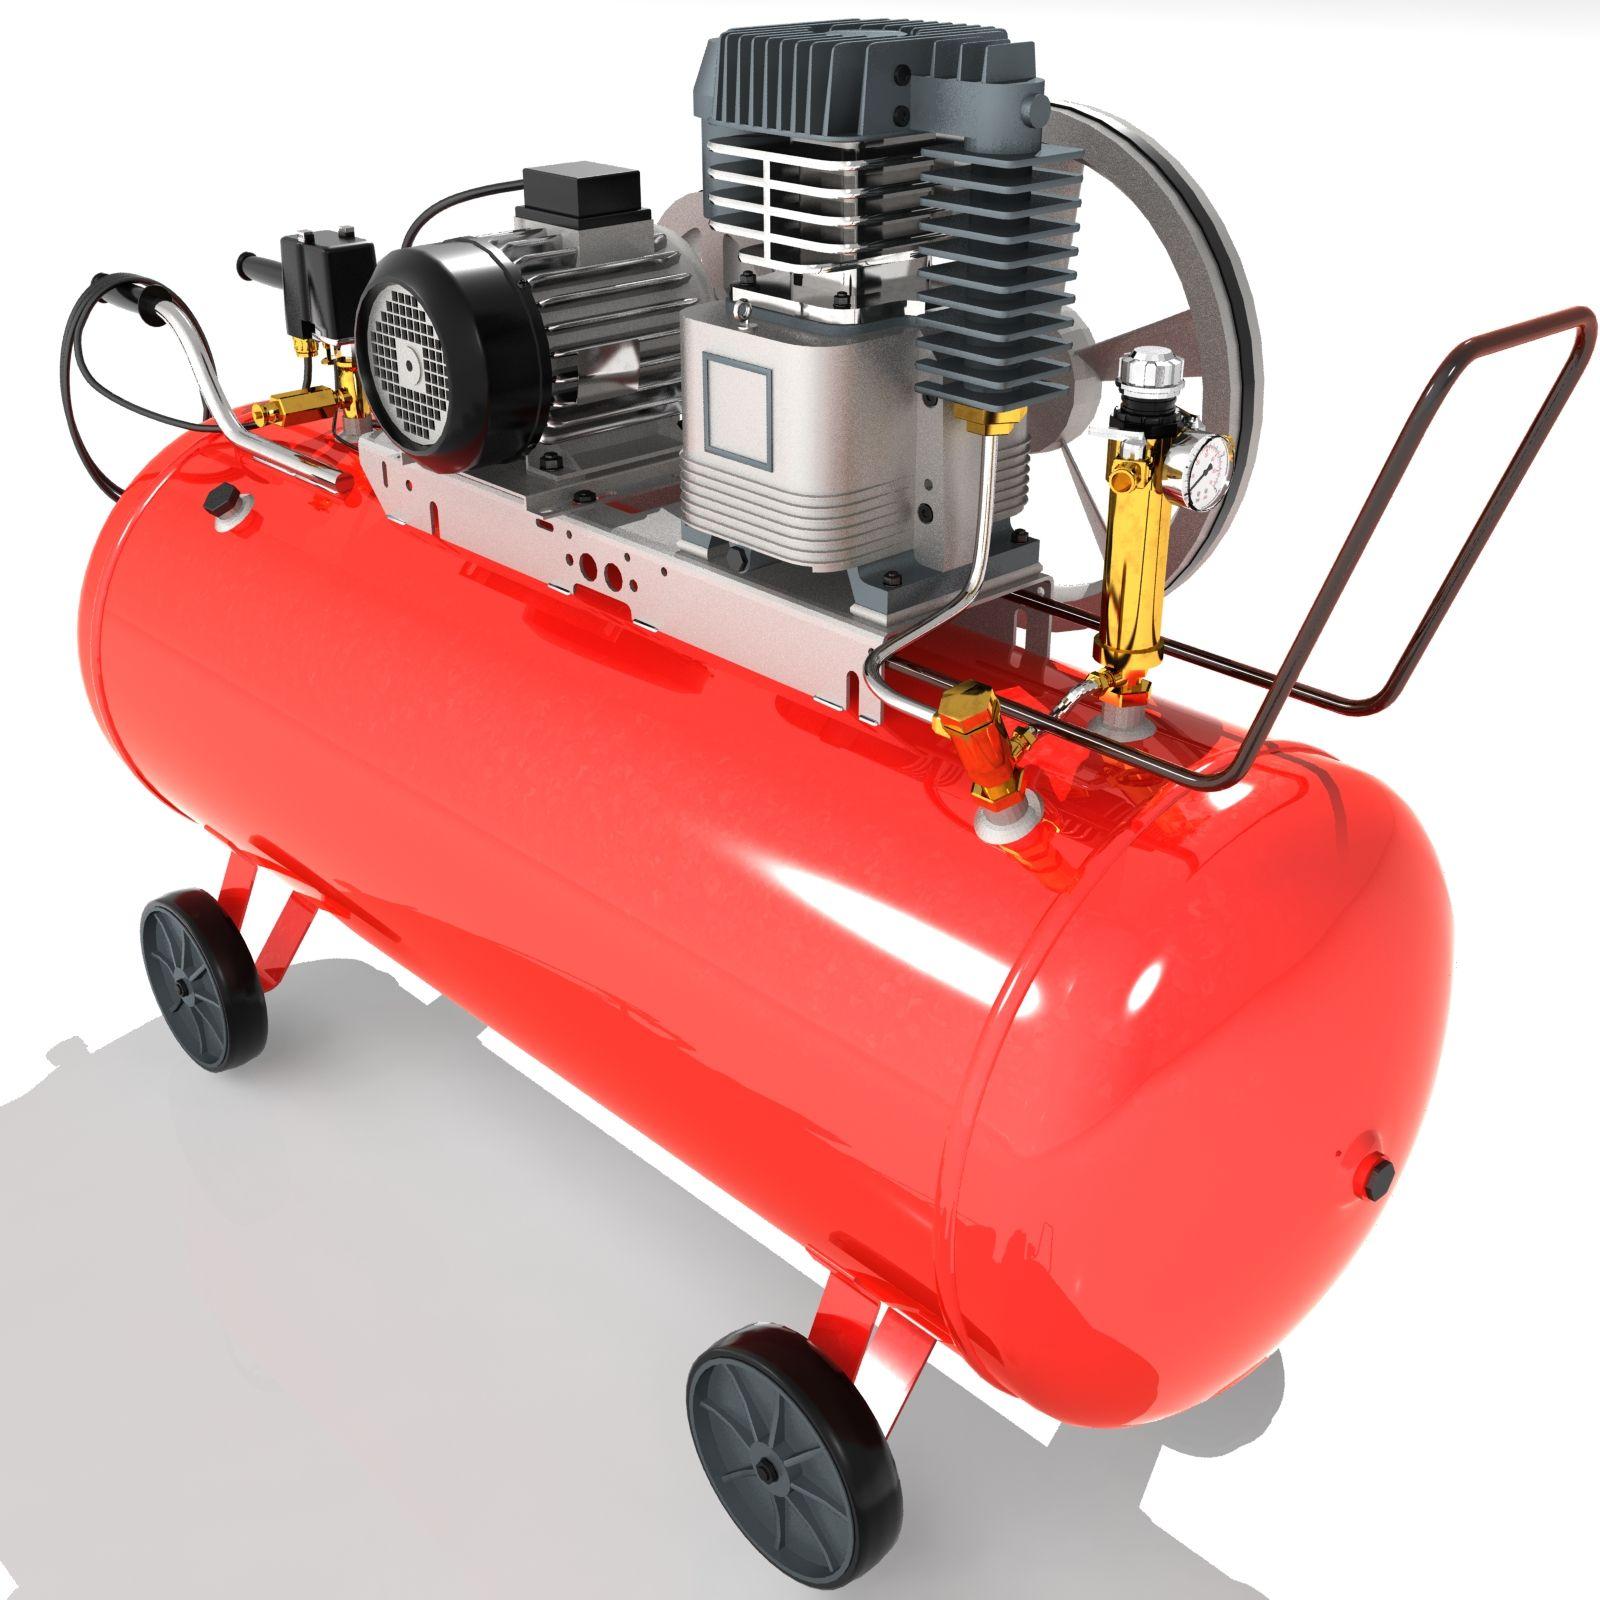 Electric Air Compressor Electric, Air, Compressor